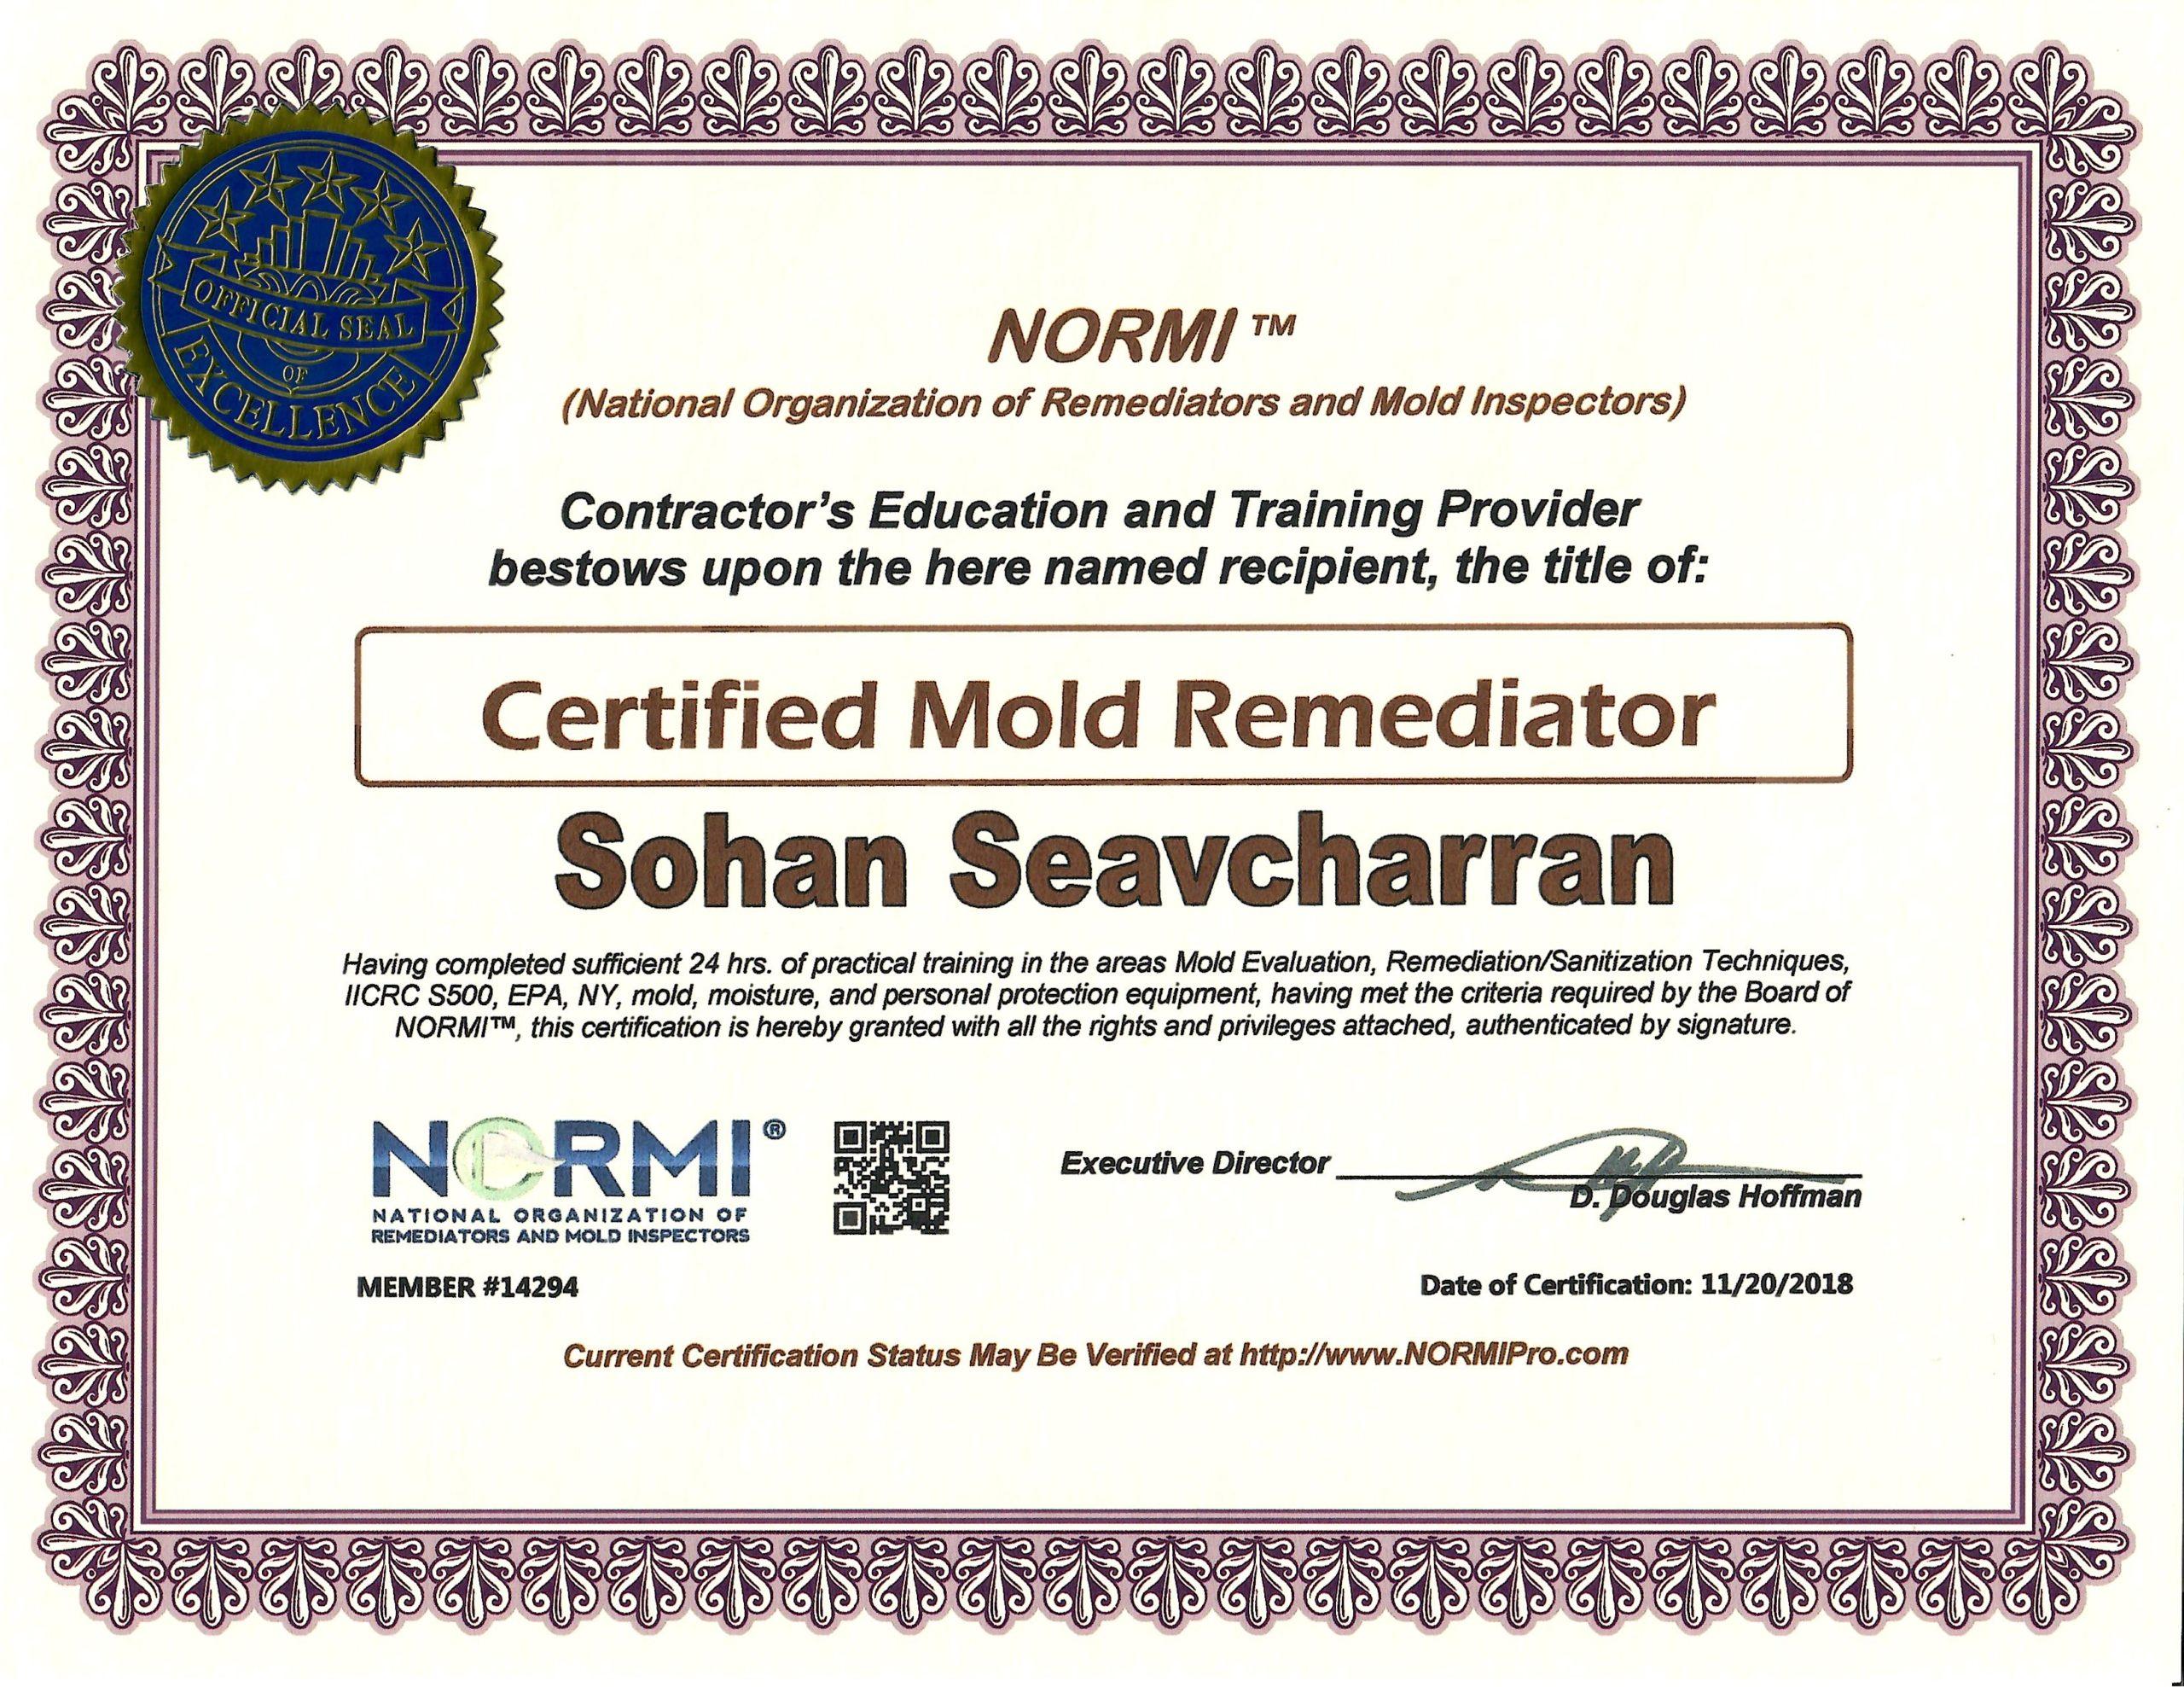 NORMI CMR jpg file